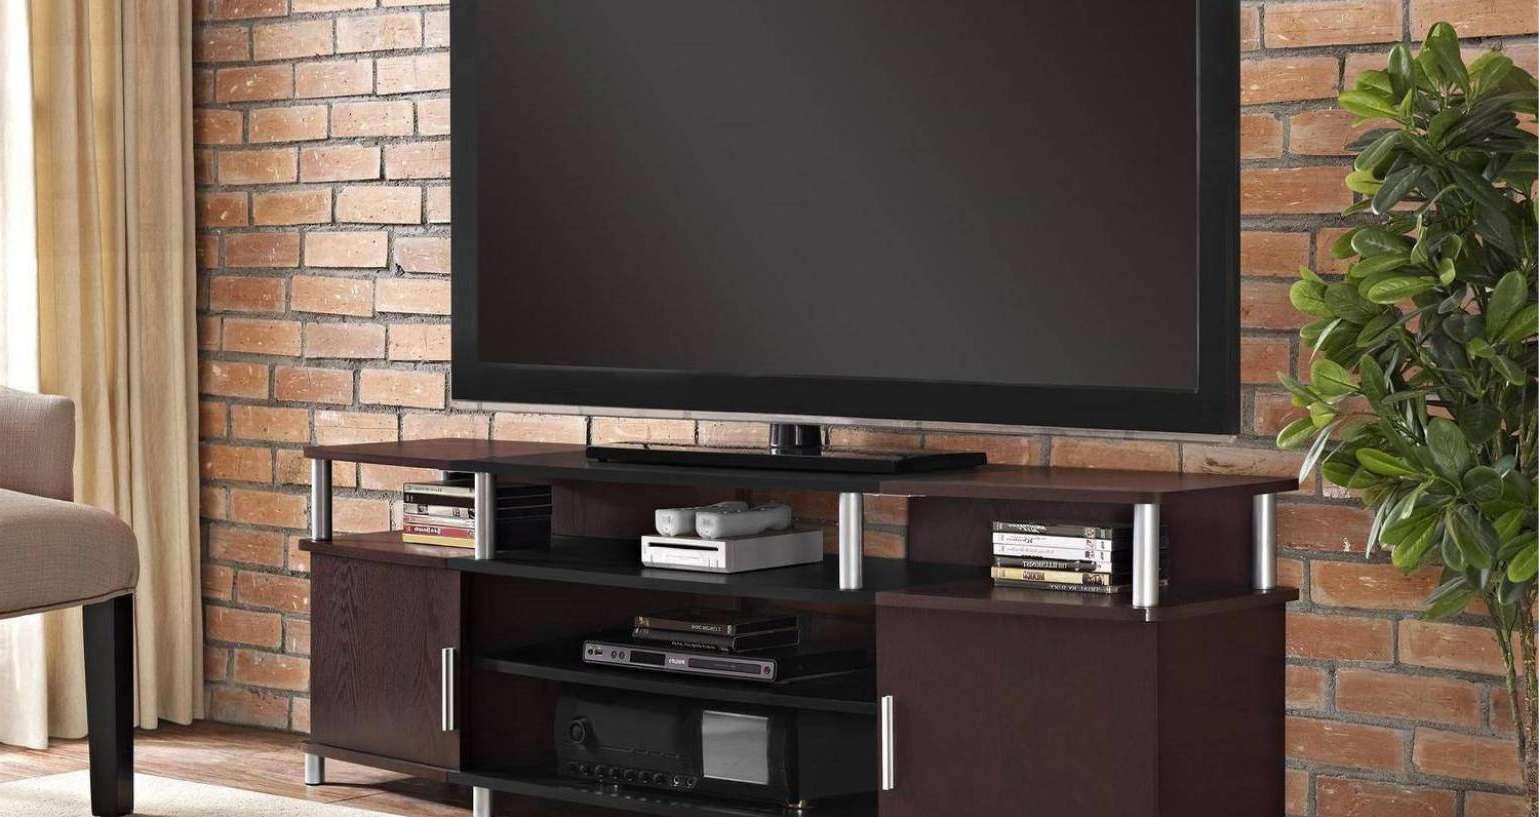 Tv : Cherry Wood Tv Cabinets Terrific Cherry Wood Tv Stands For For Cherry Wood Tv Cabinets (View 12 of 20)